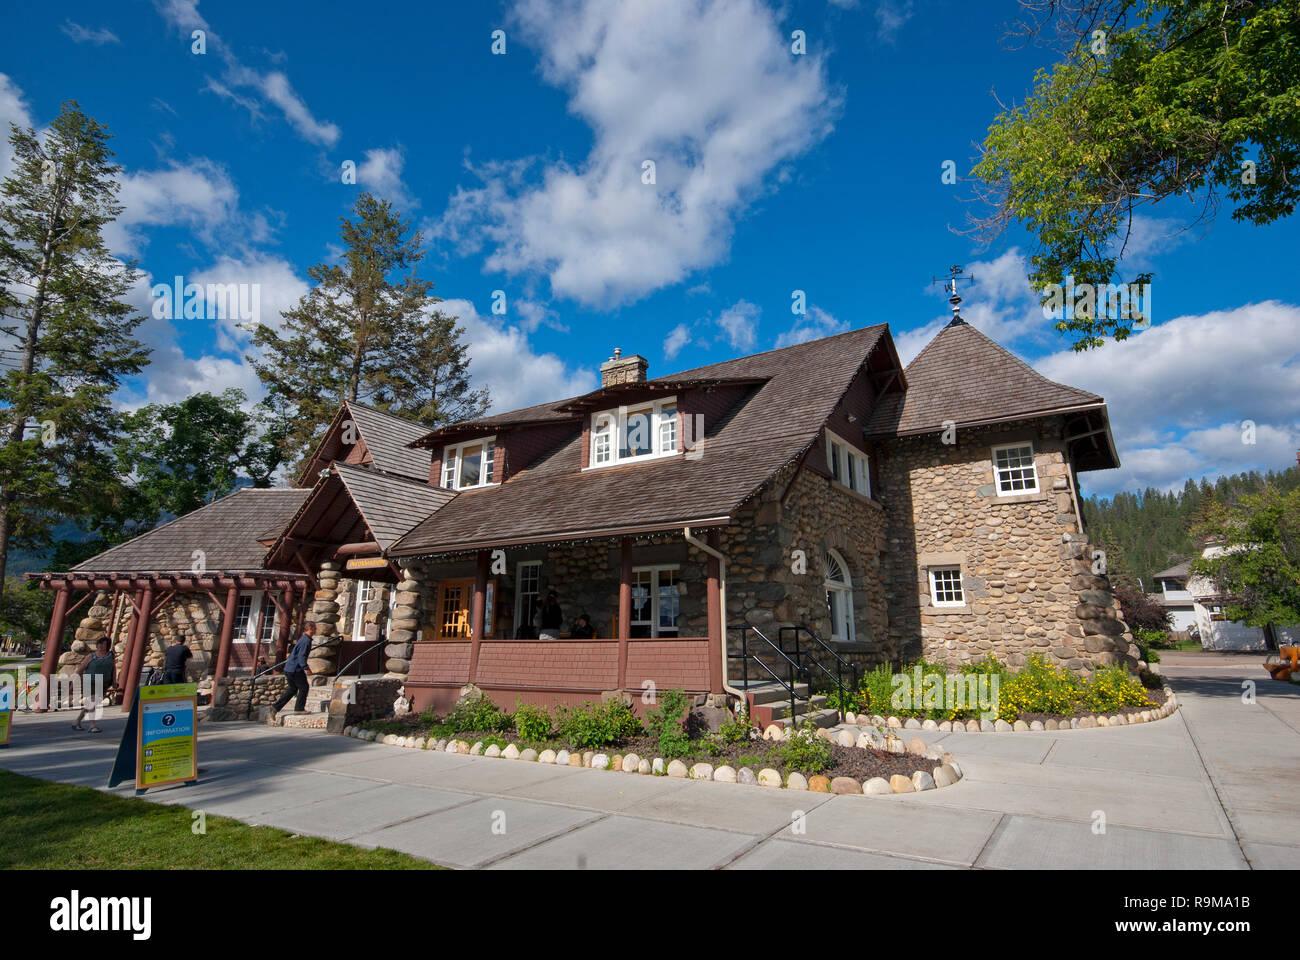 Information Centre in Jasper village, Jasper National Park, Rocky Mountains, Alberta, Canada - Stock Image